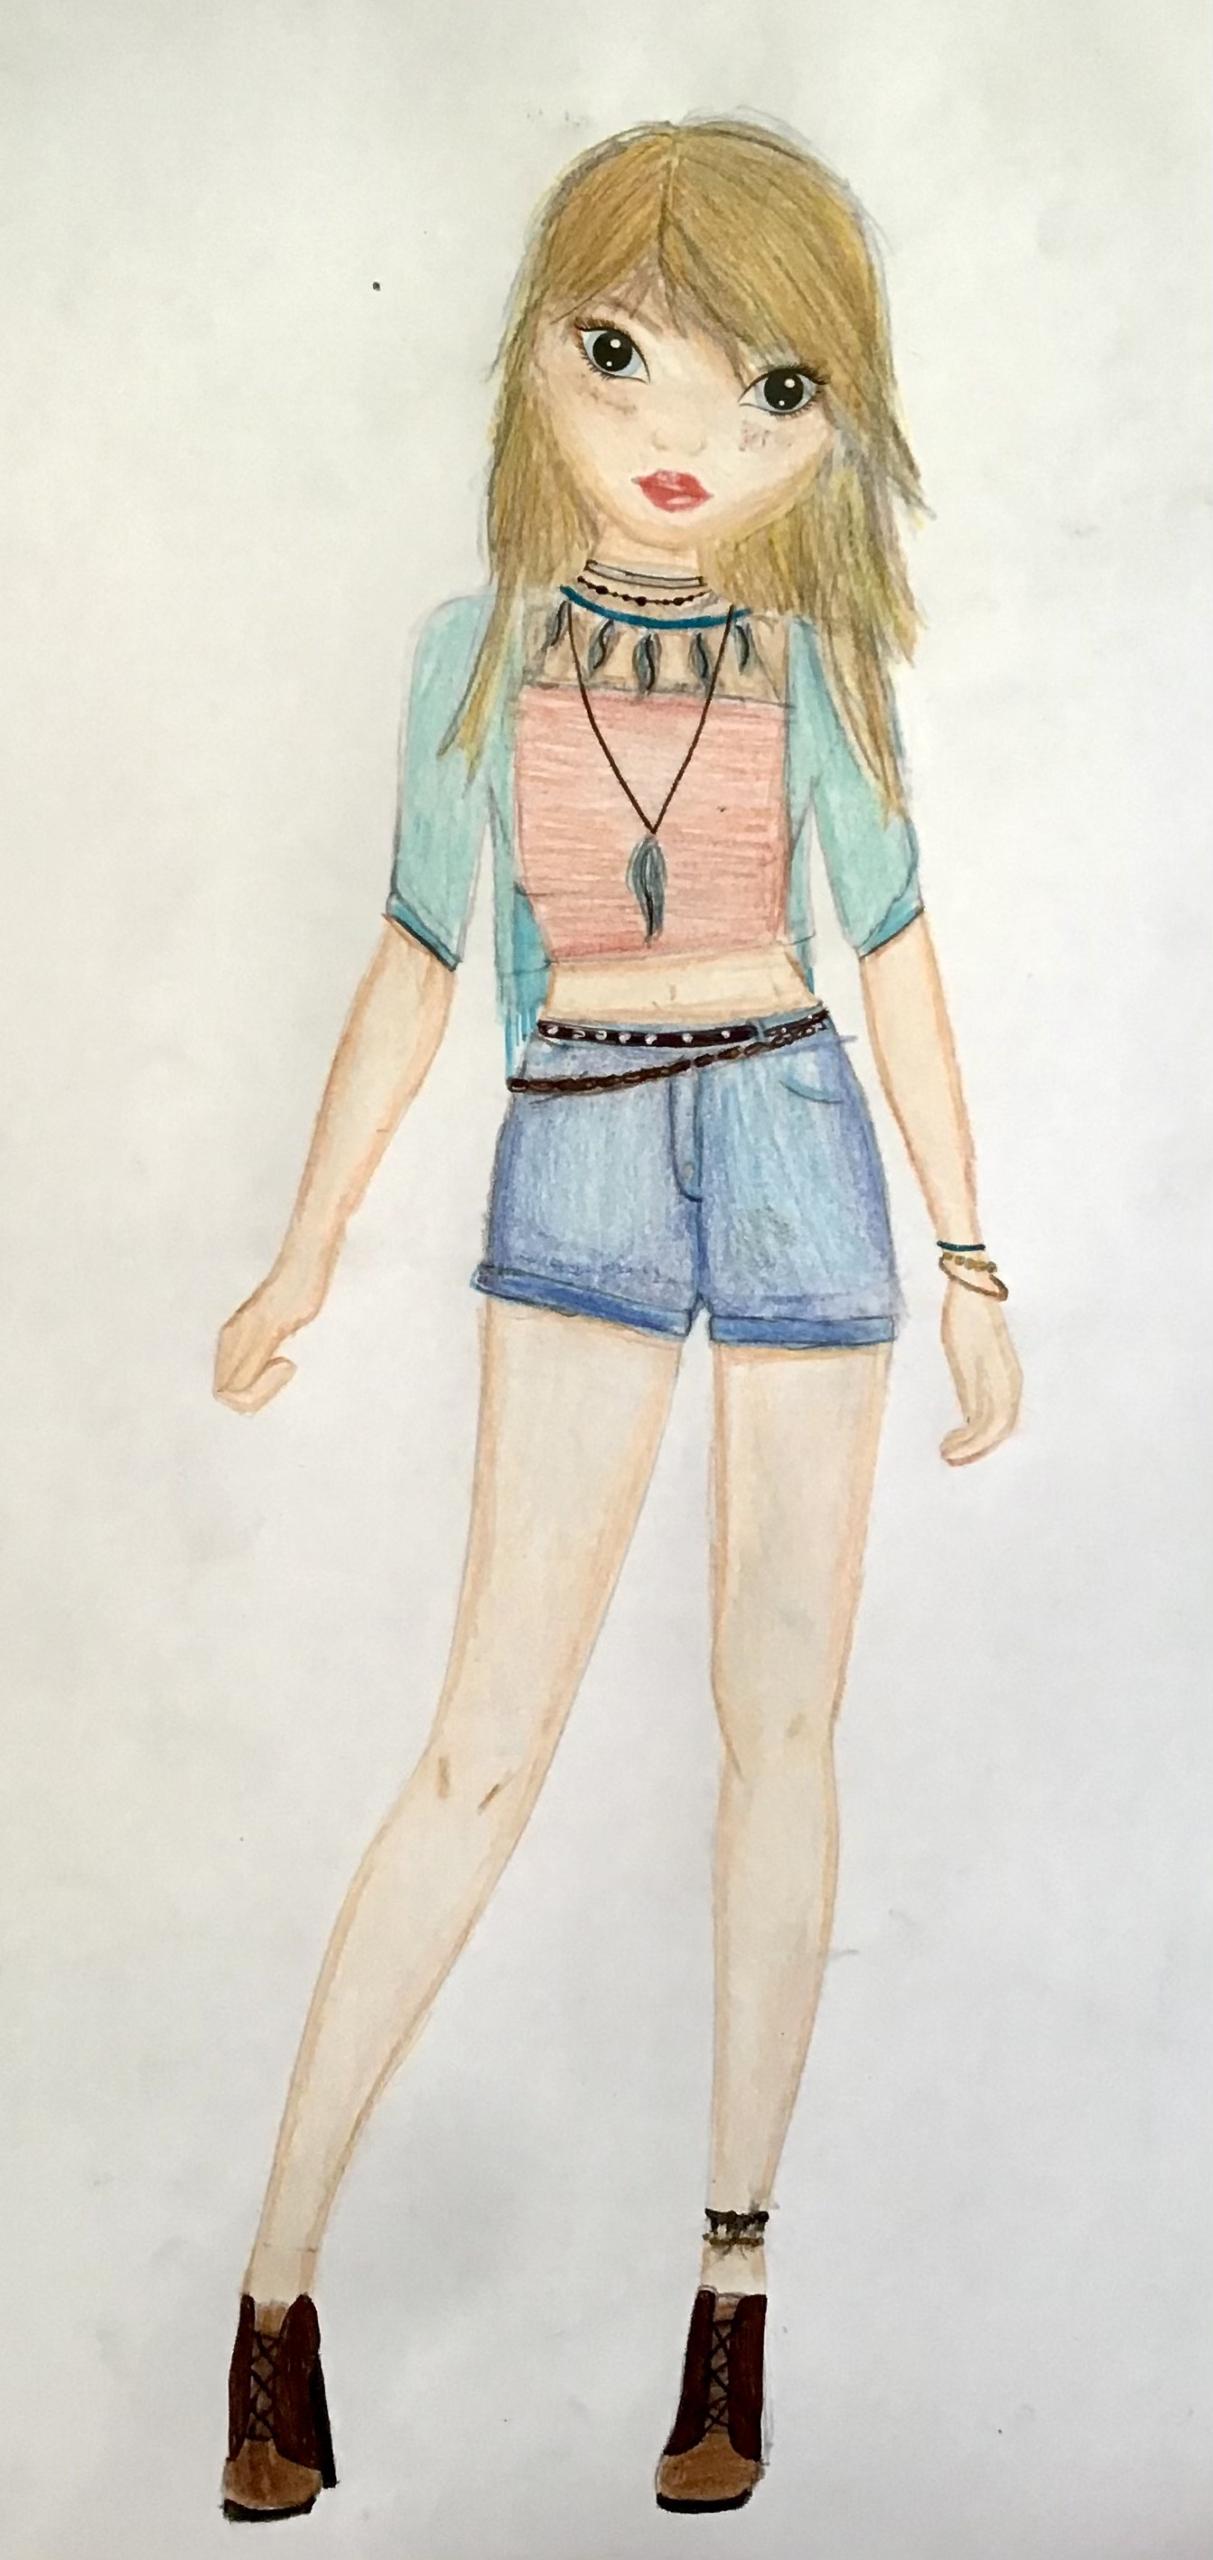 Talia C., 12 Jahre, aus D